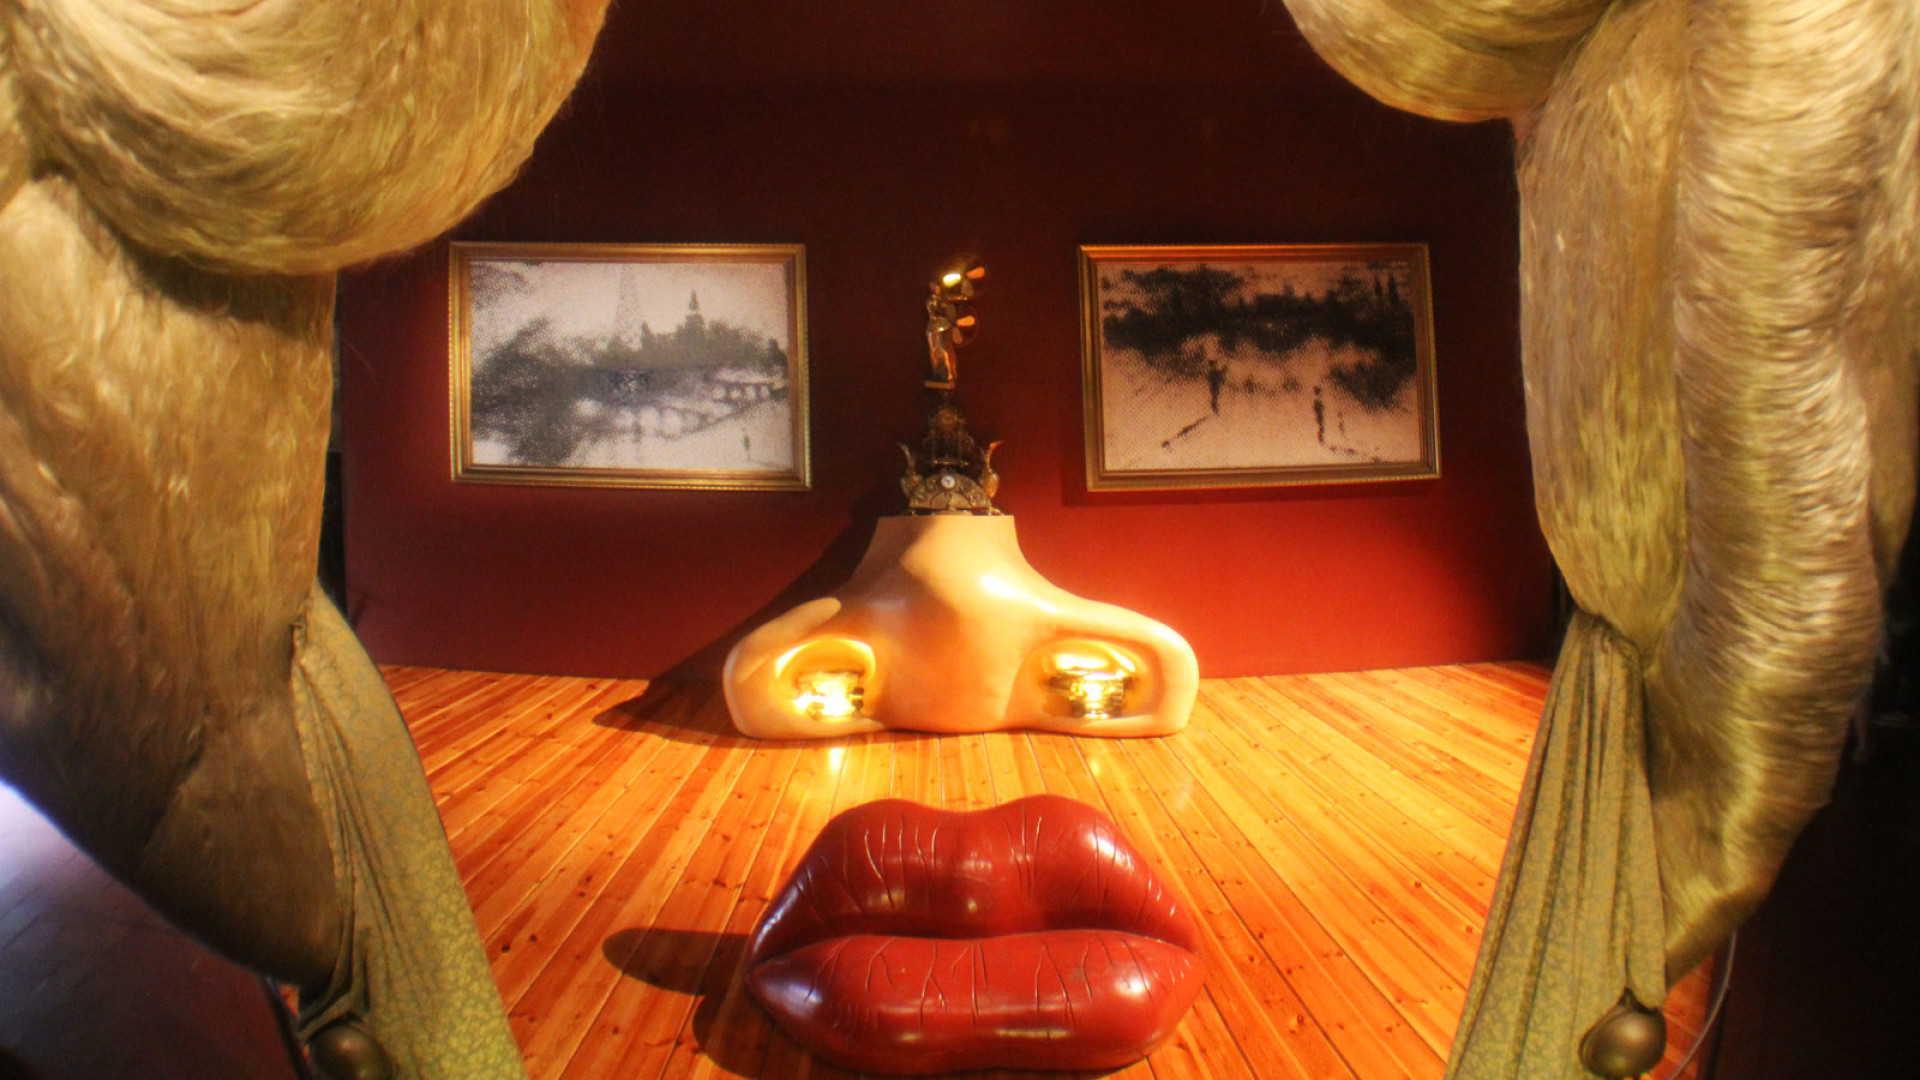 DALÍ MUSEUM & COSTA BRAVA EXPERIENCE